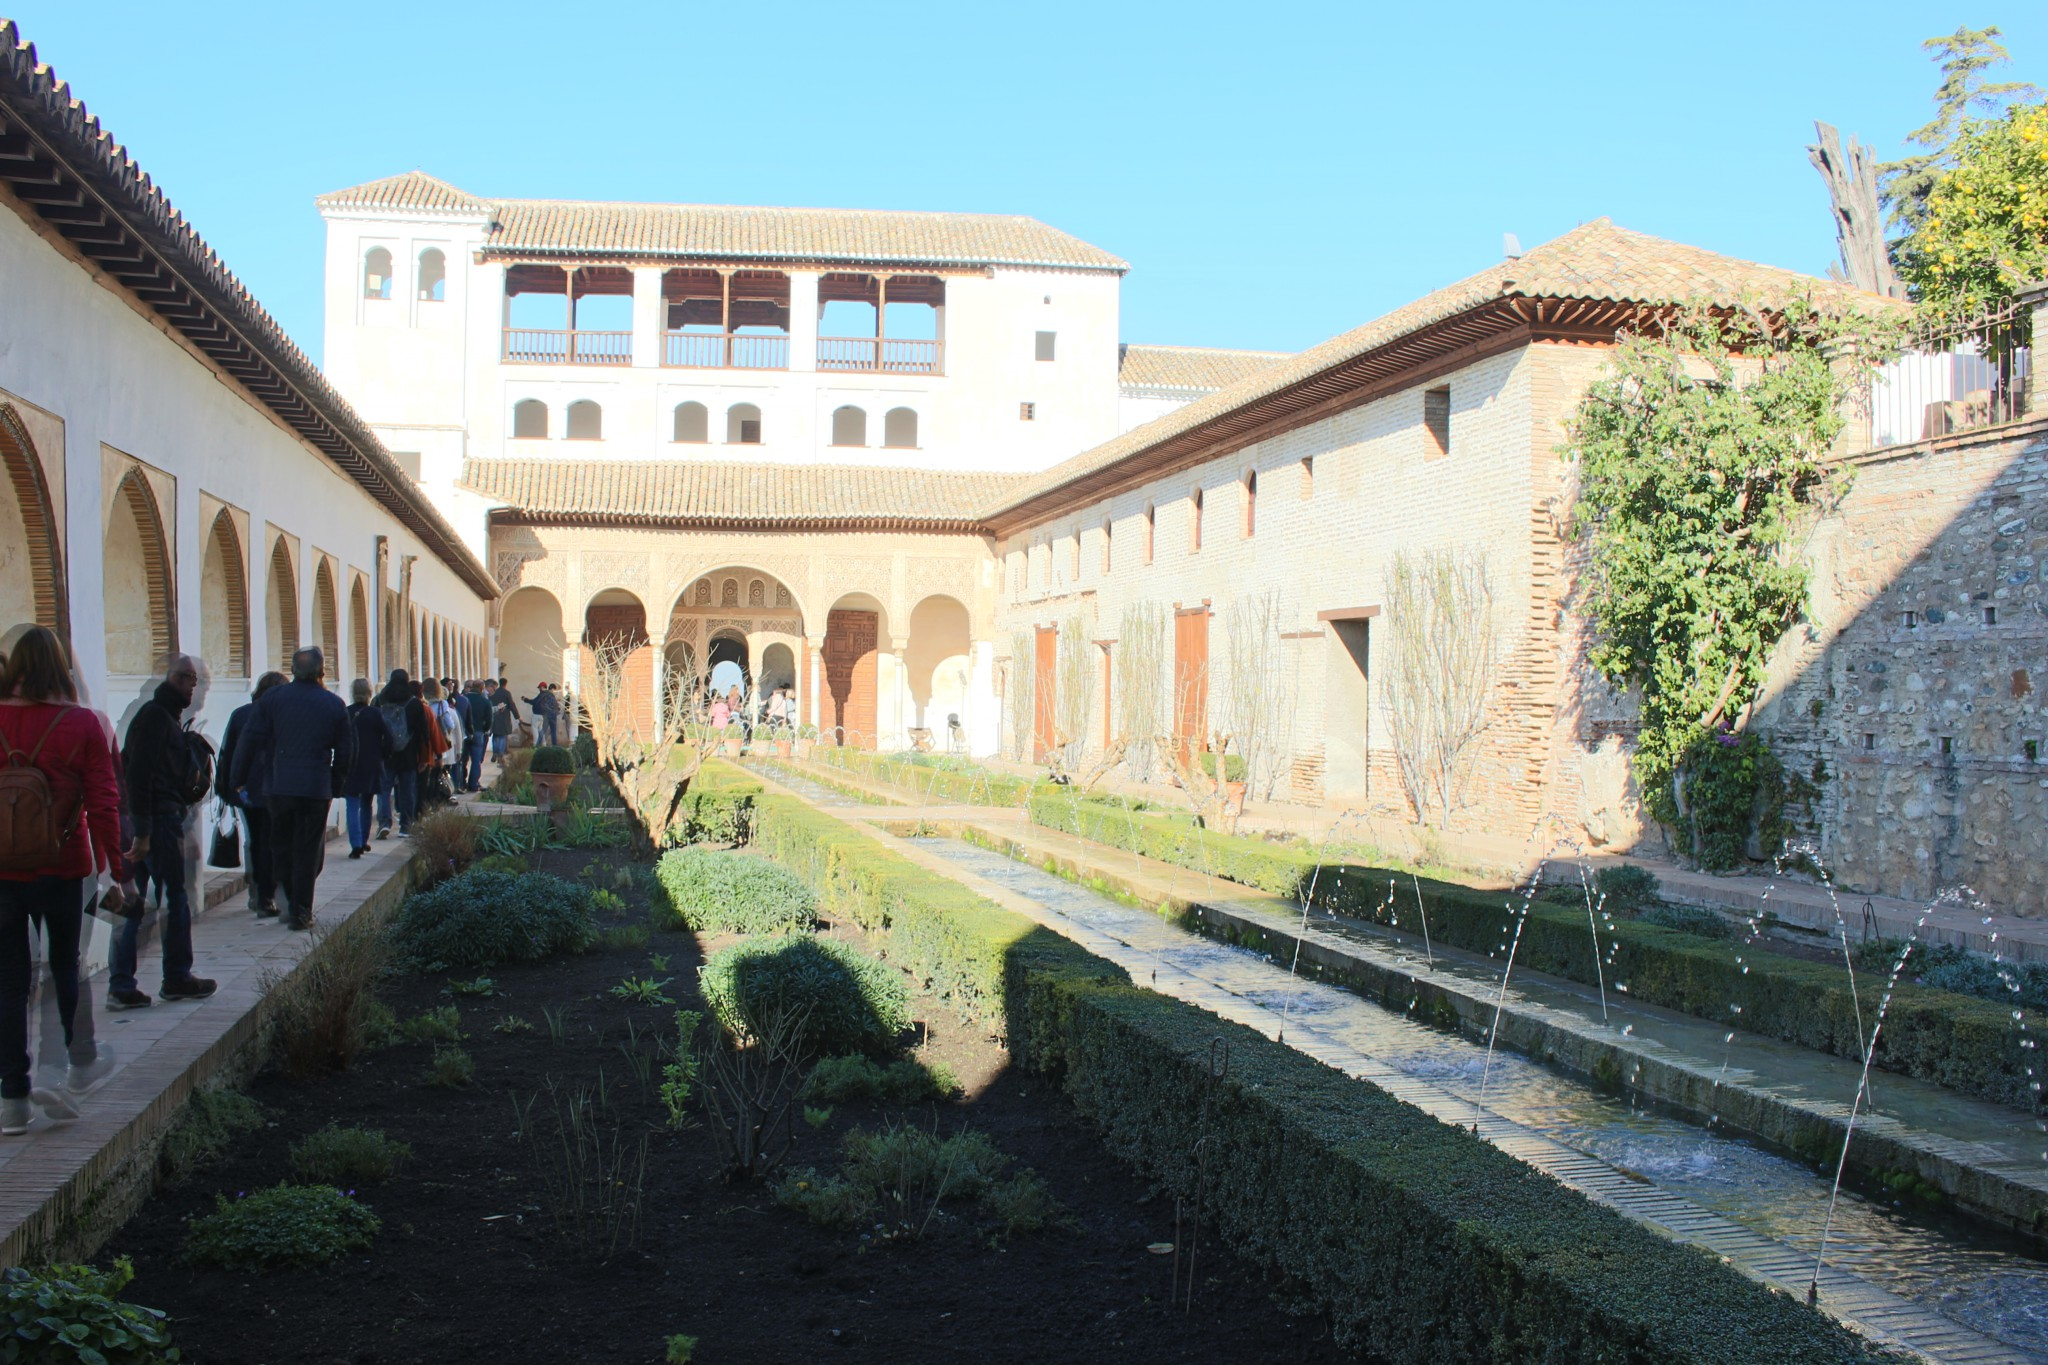 Visitar jardines Generalife - Alhambra - Visitar Granada